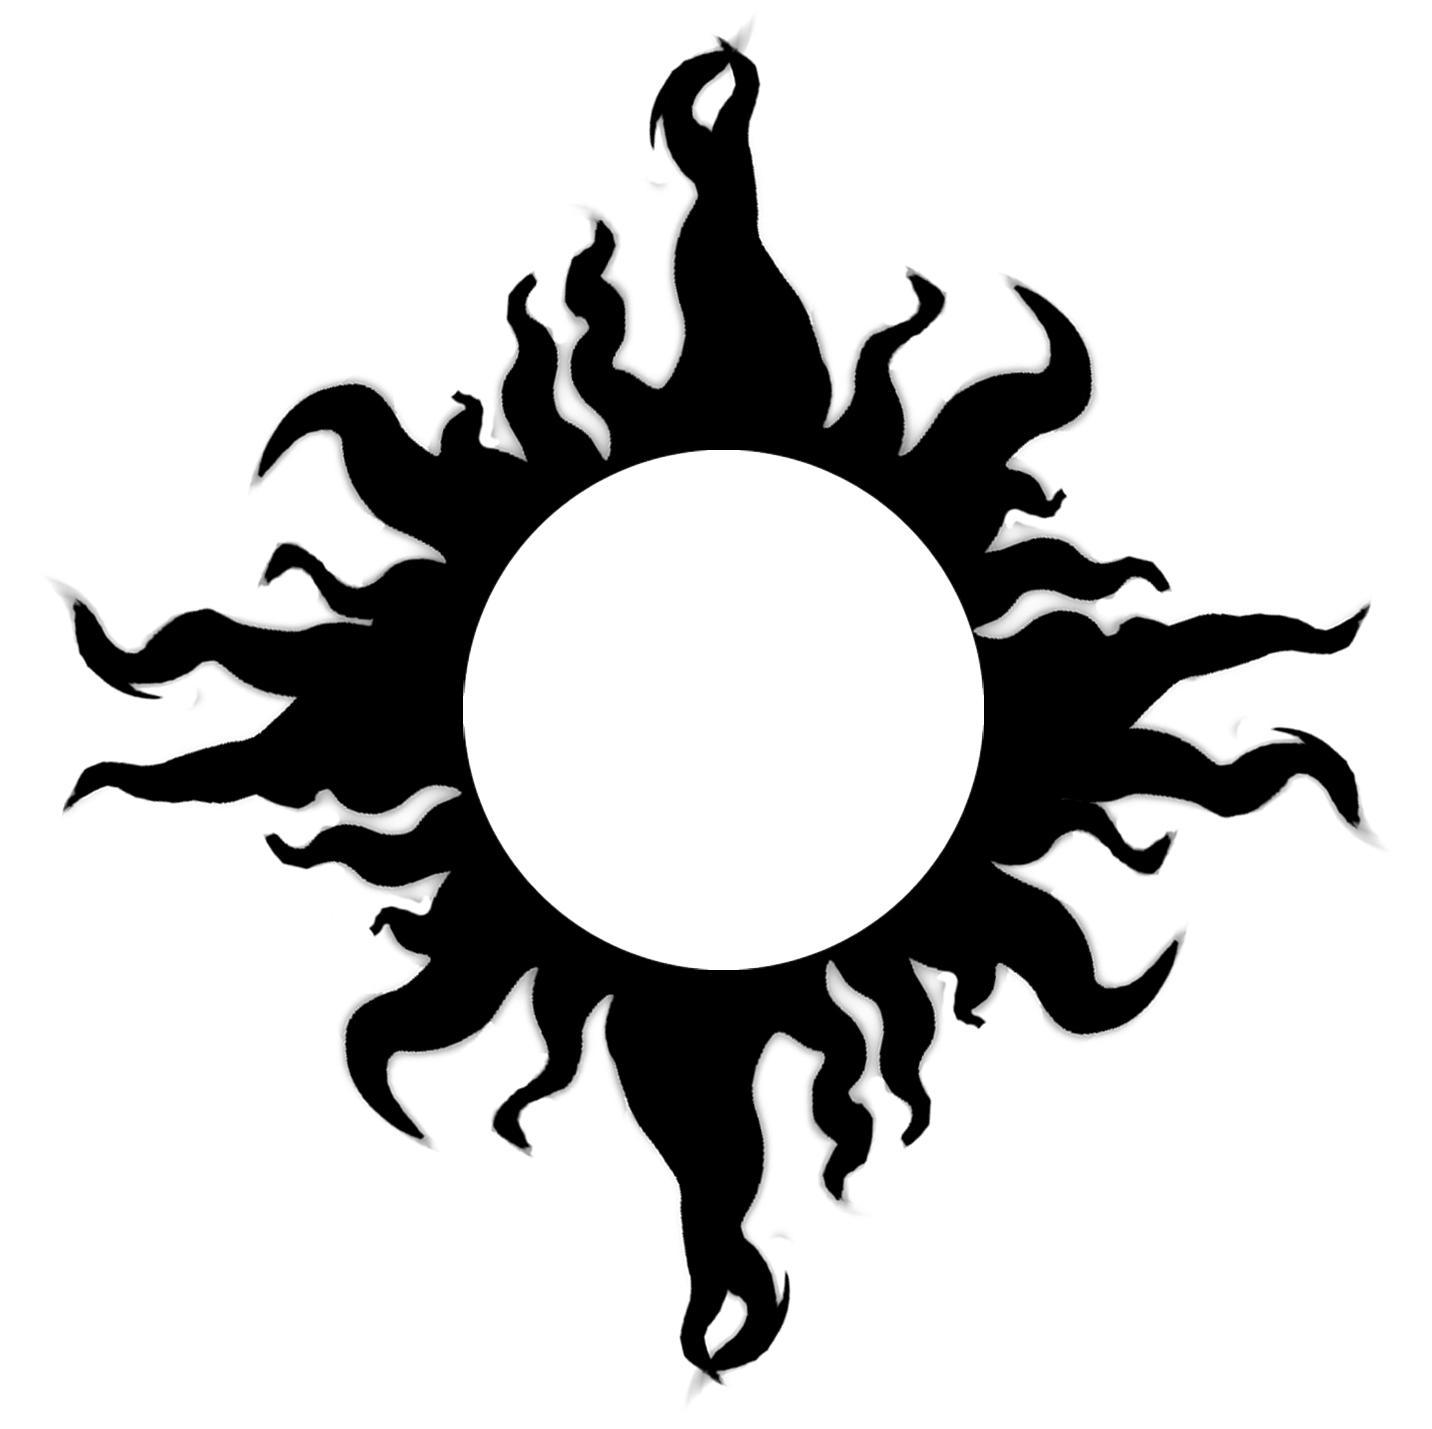 Basic Sun By Solarismyst On DeviantArt